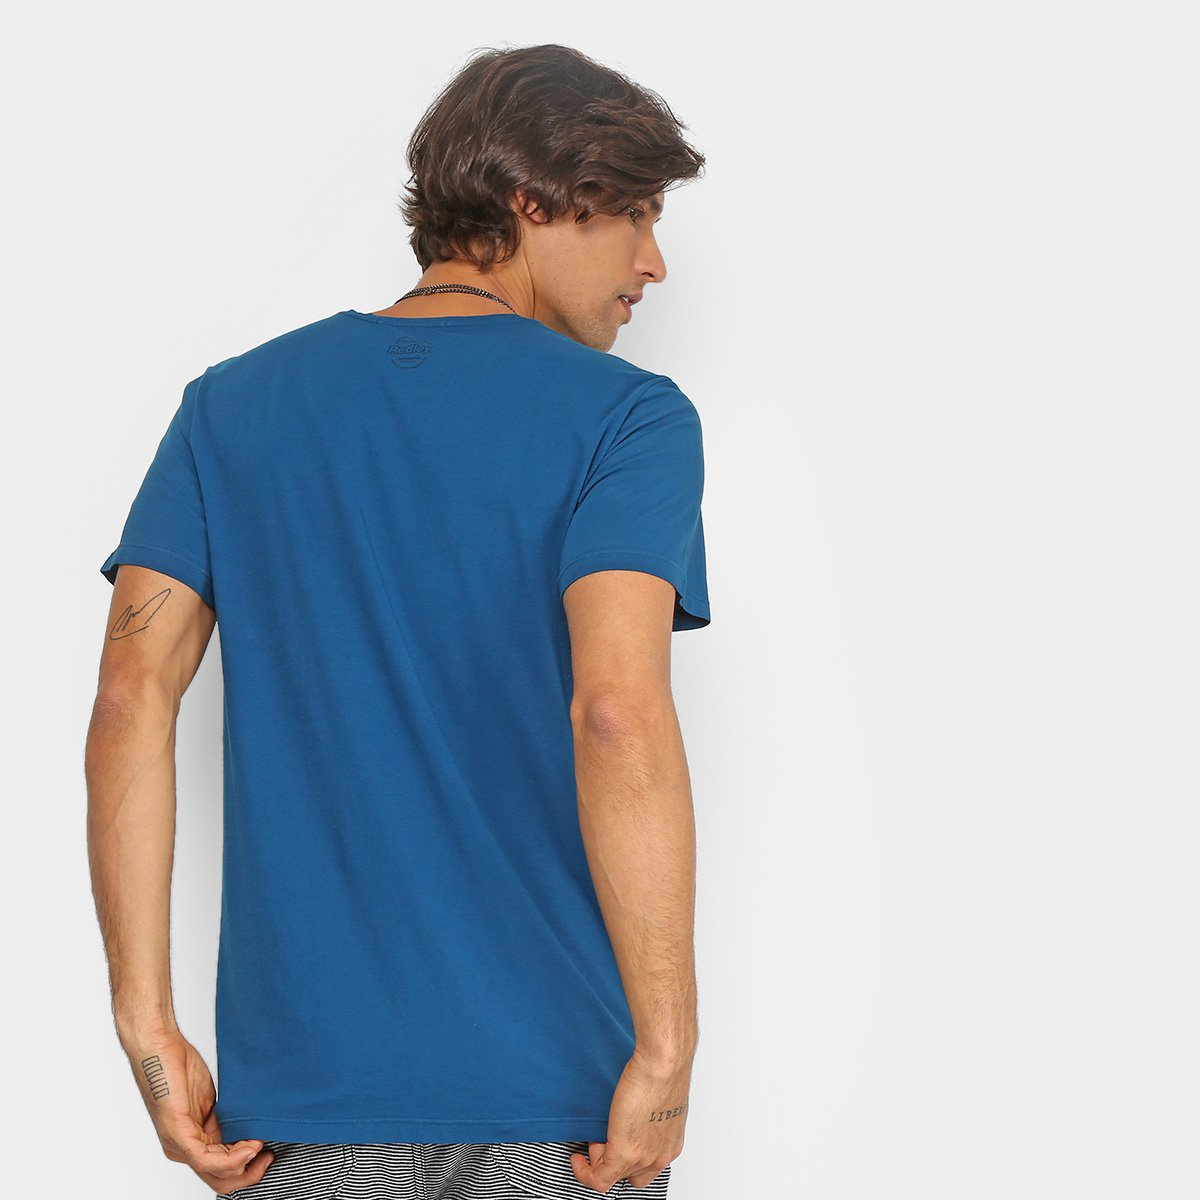 e6906f943a Camiseta Redley Bolso Frontal Masculina  Camiseta Redley Bolso Frontal  Masculina ...